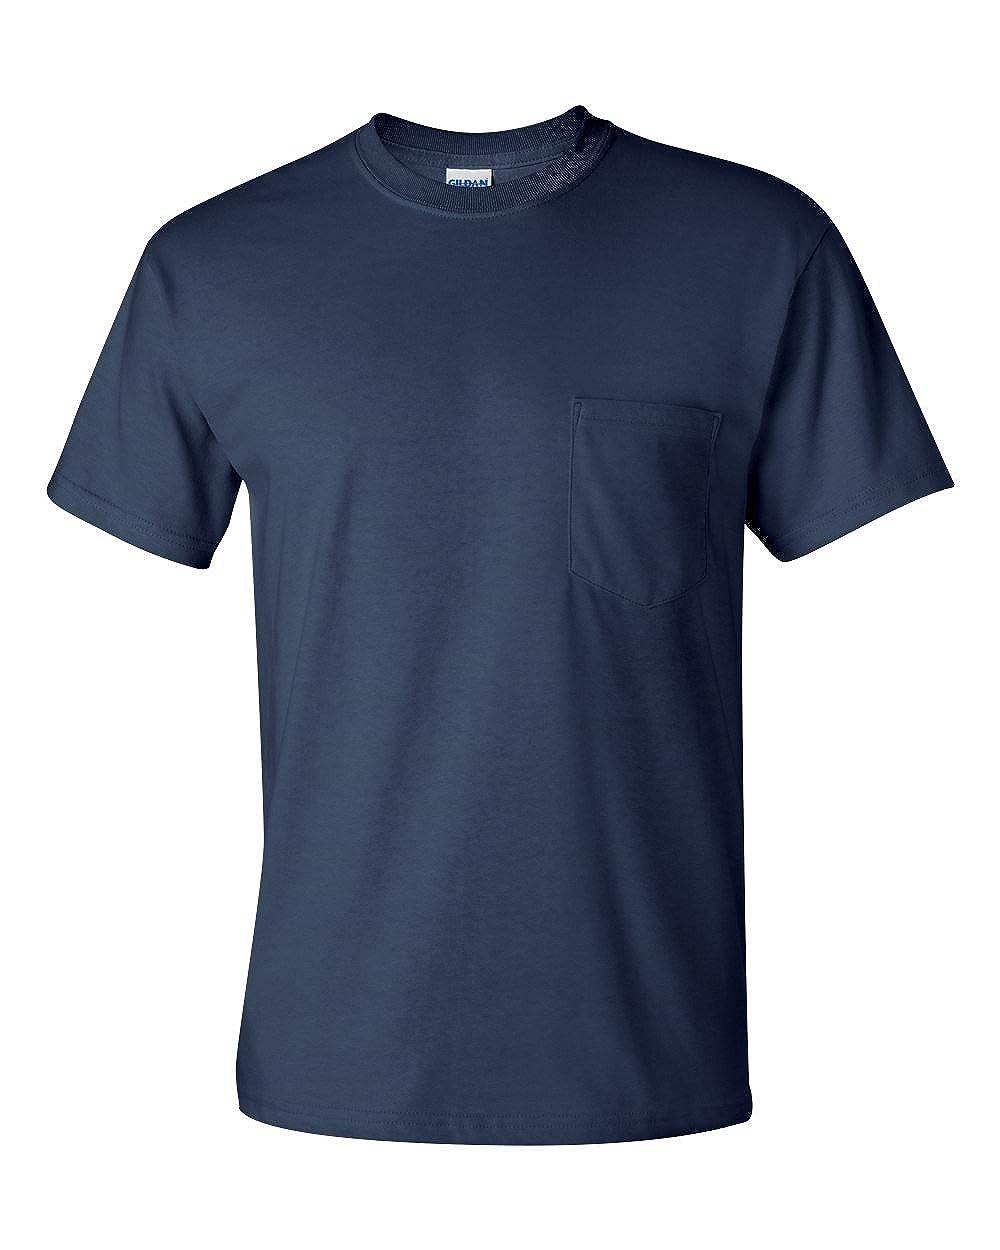 Other Hunting Gun Storage T-shirt Xxxl Desert Tan Free Shipping On Whole Order W Purchase 3xl Xxx Large